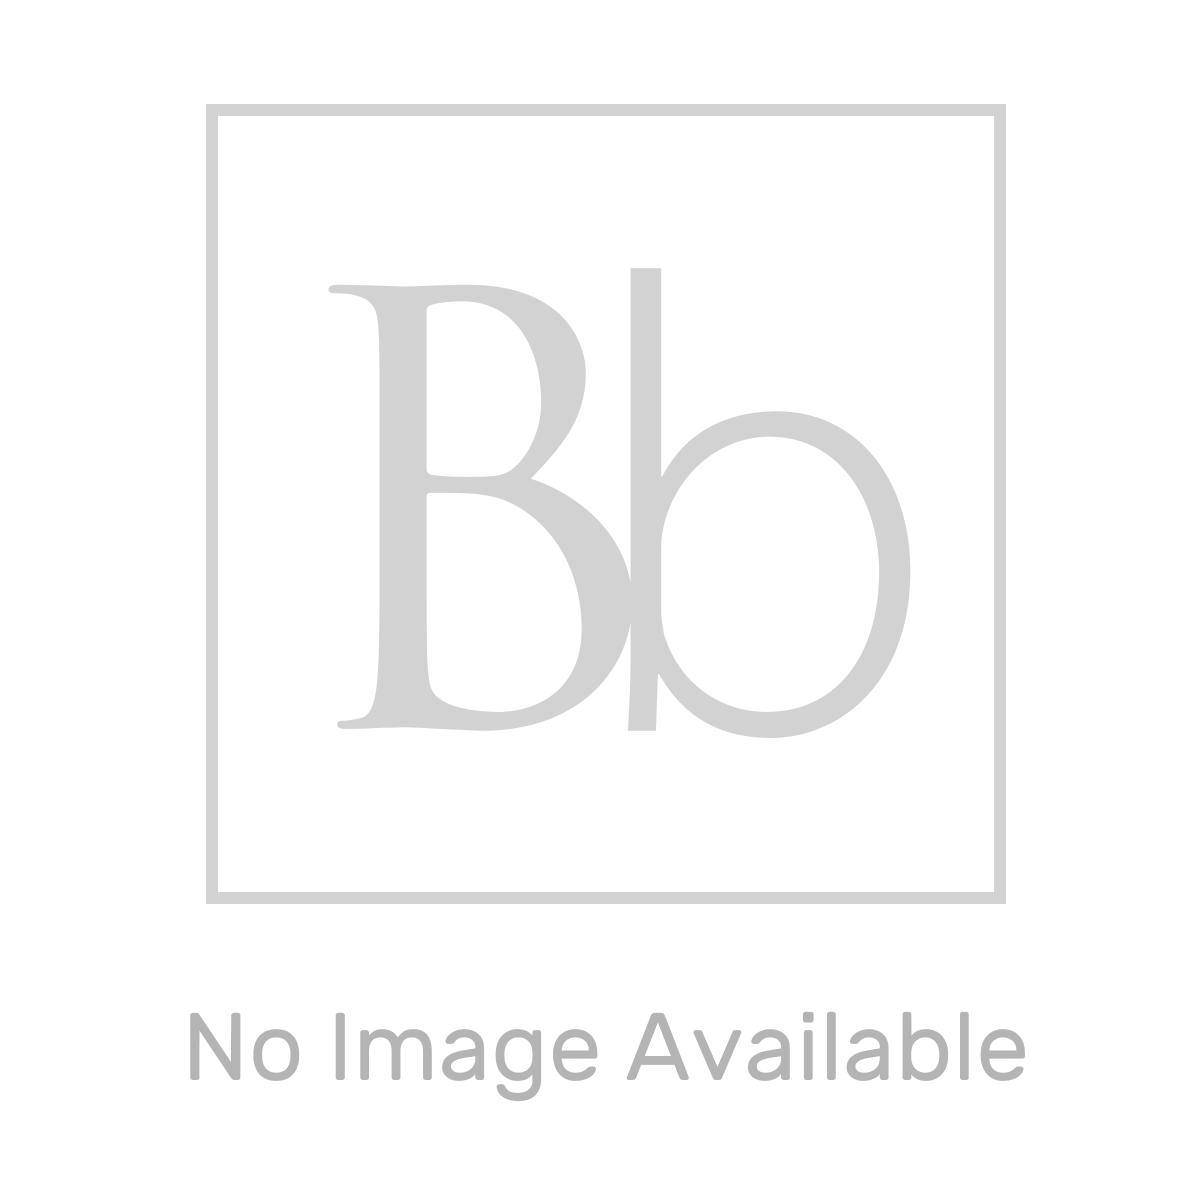 Frontline Aquaglass+ Sphere Black Tinted Offset Quadrant Shower Enclosure